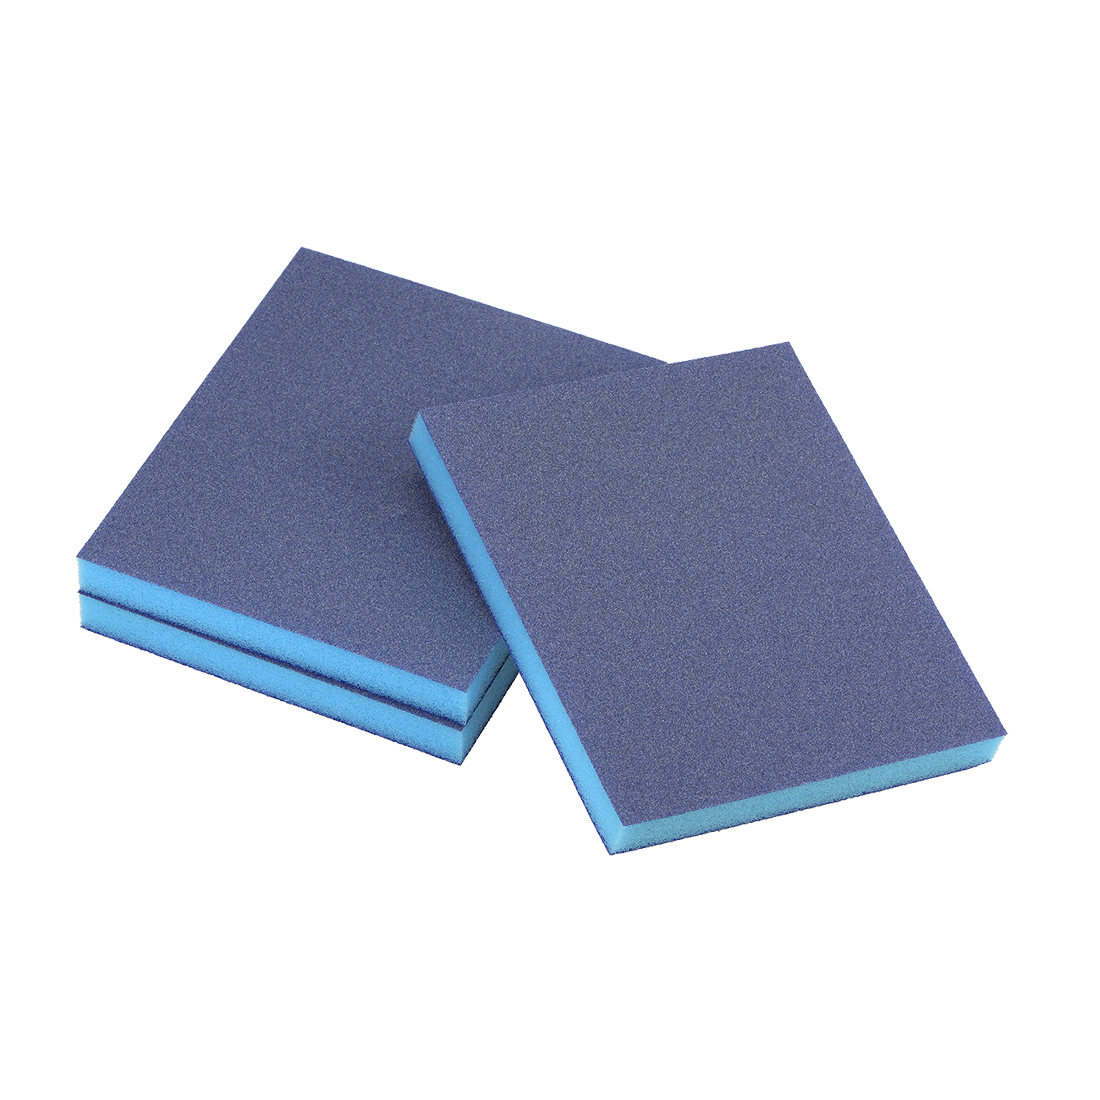 Sanding Sponge 180 Grit Sanding Block Pad Blue 3pcs